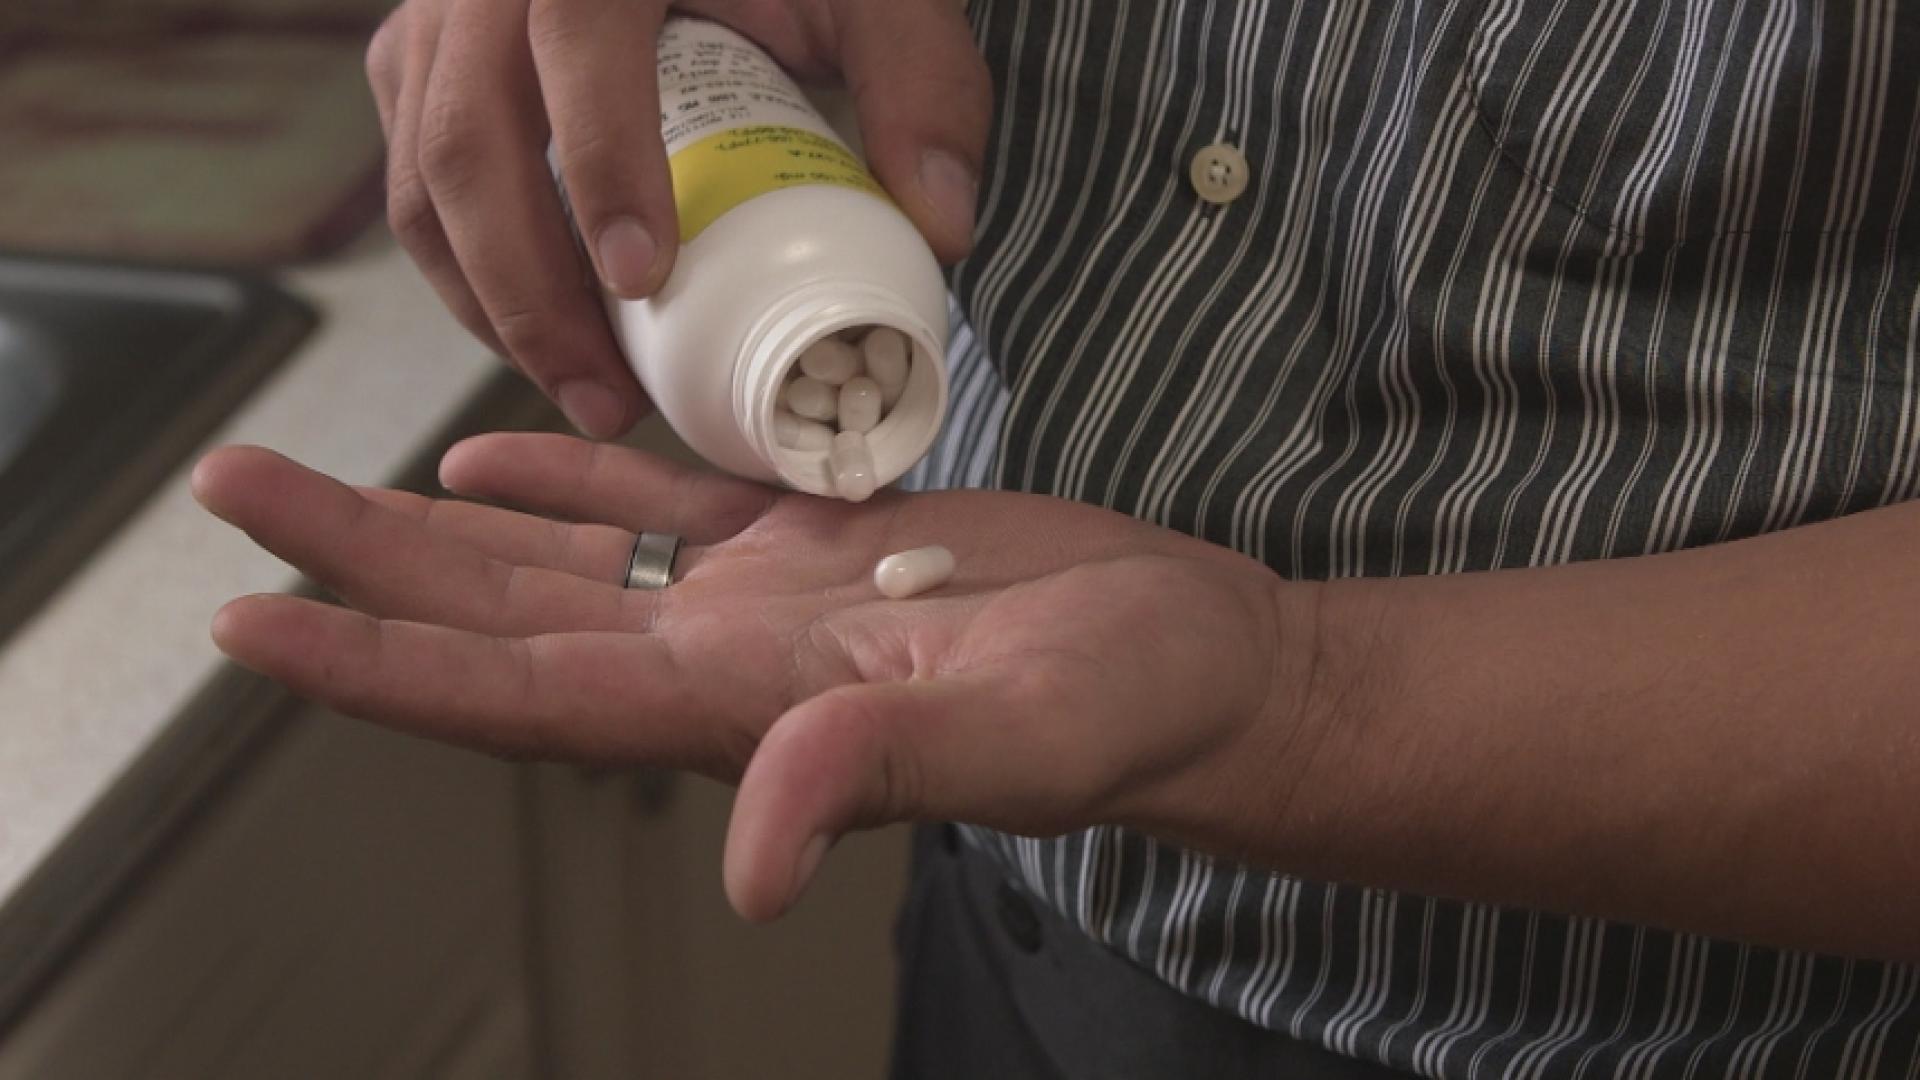 FDA approves breakthrough cancer drug that works on a genetic level